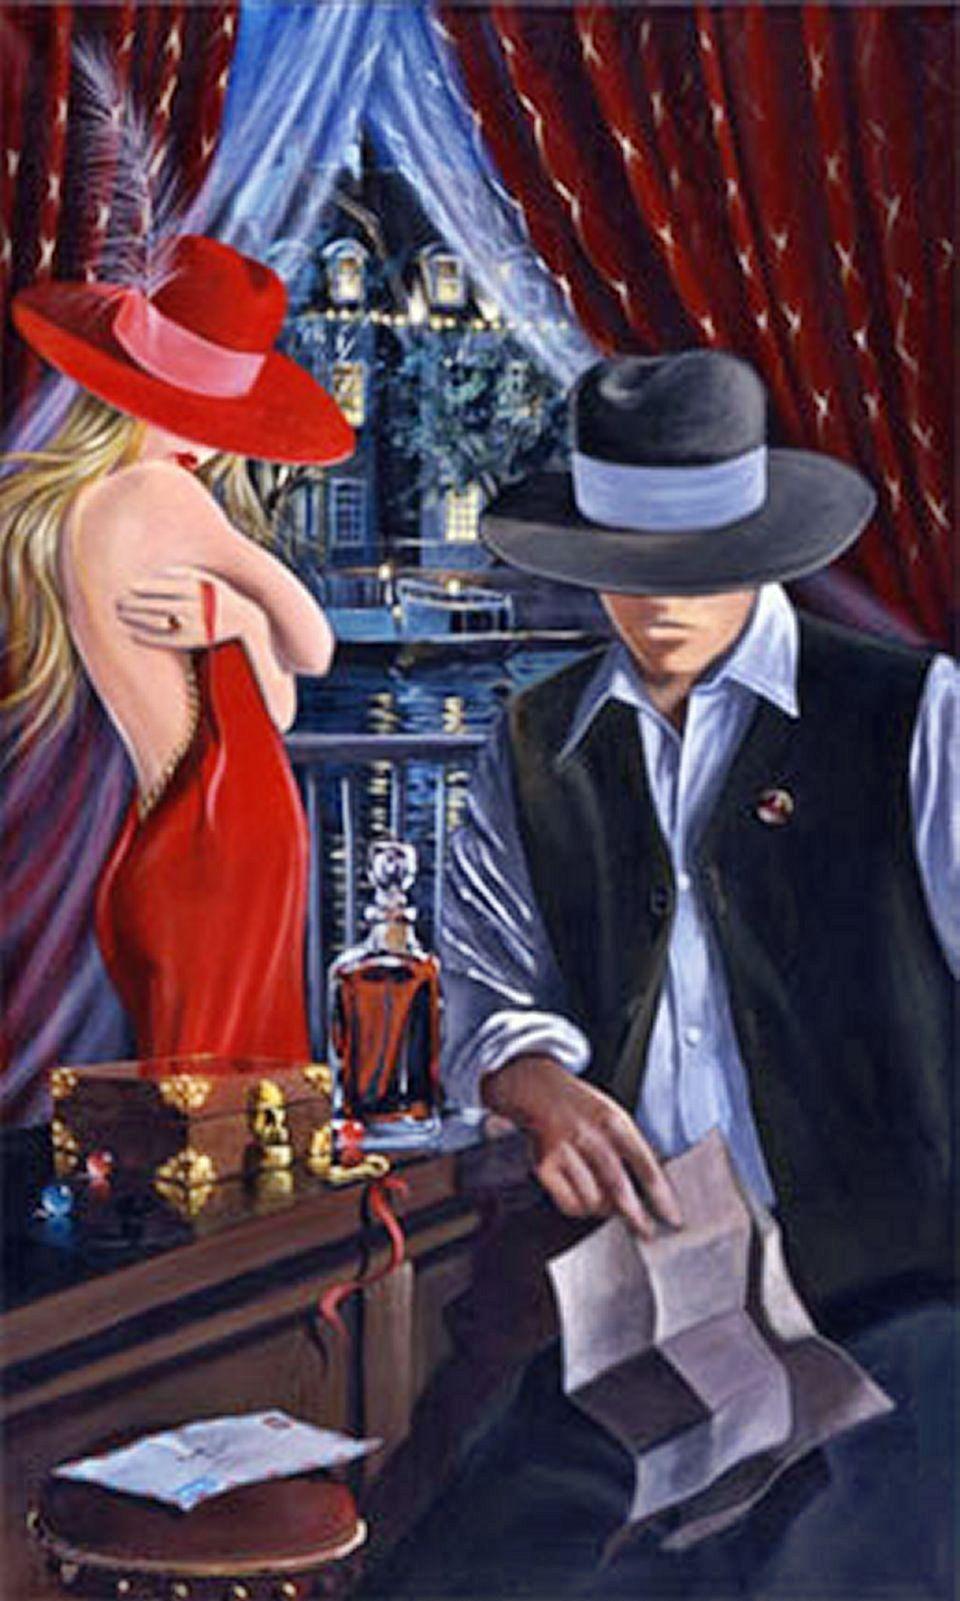 Victor Ostrovsky Arts